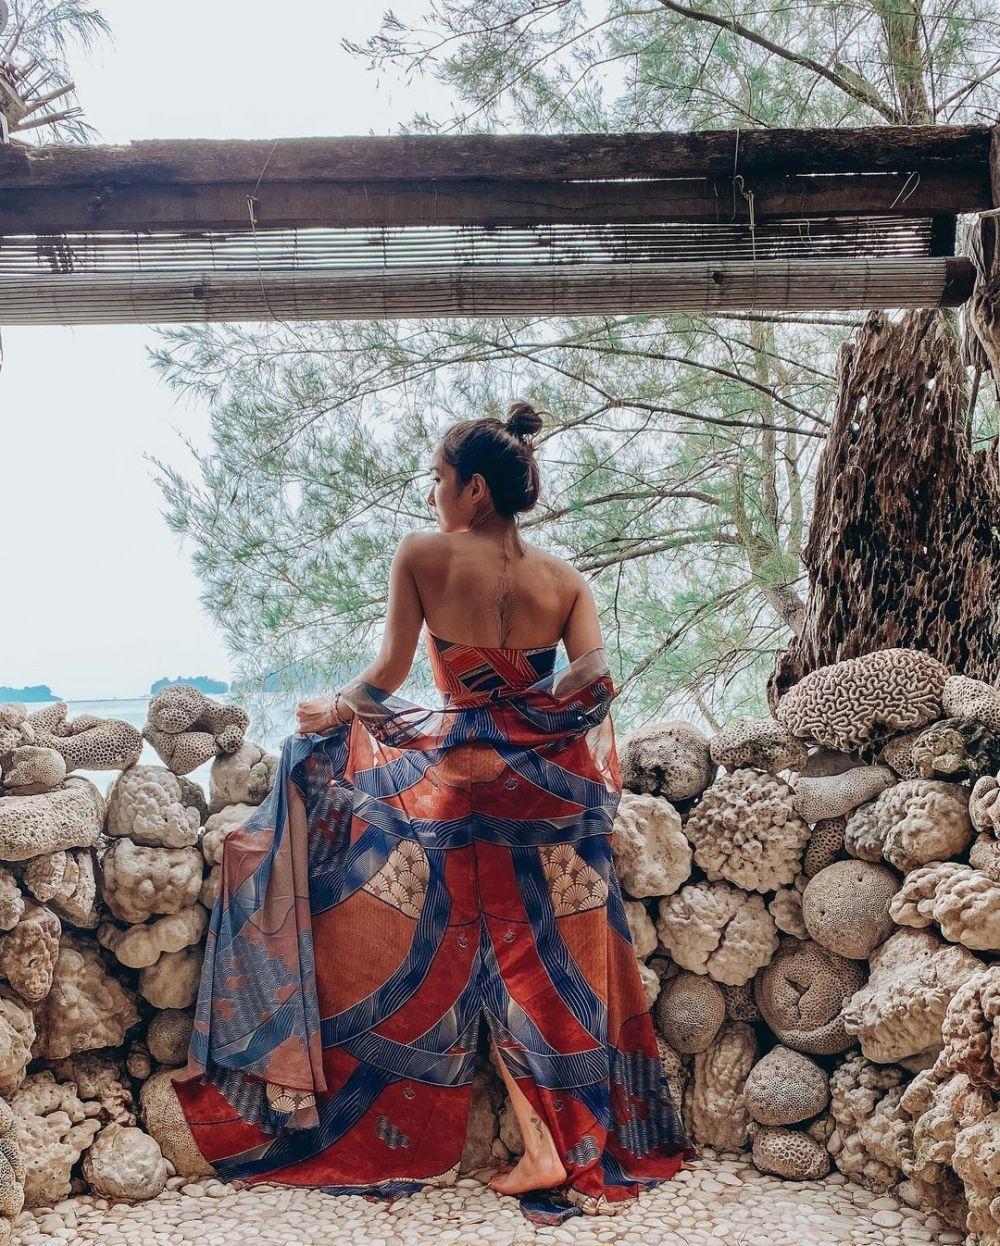 Gaya Artis Cewek Lokal Pamer Tato di Punggung, Bajunya Bikin Salfok